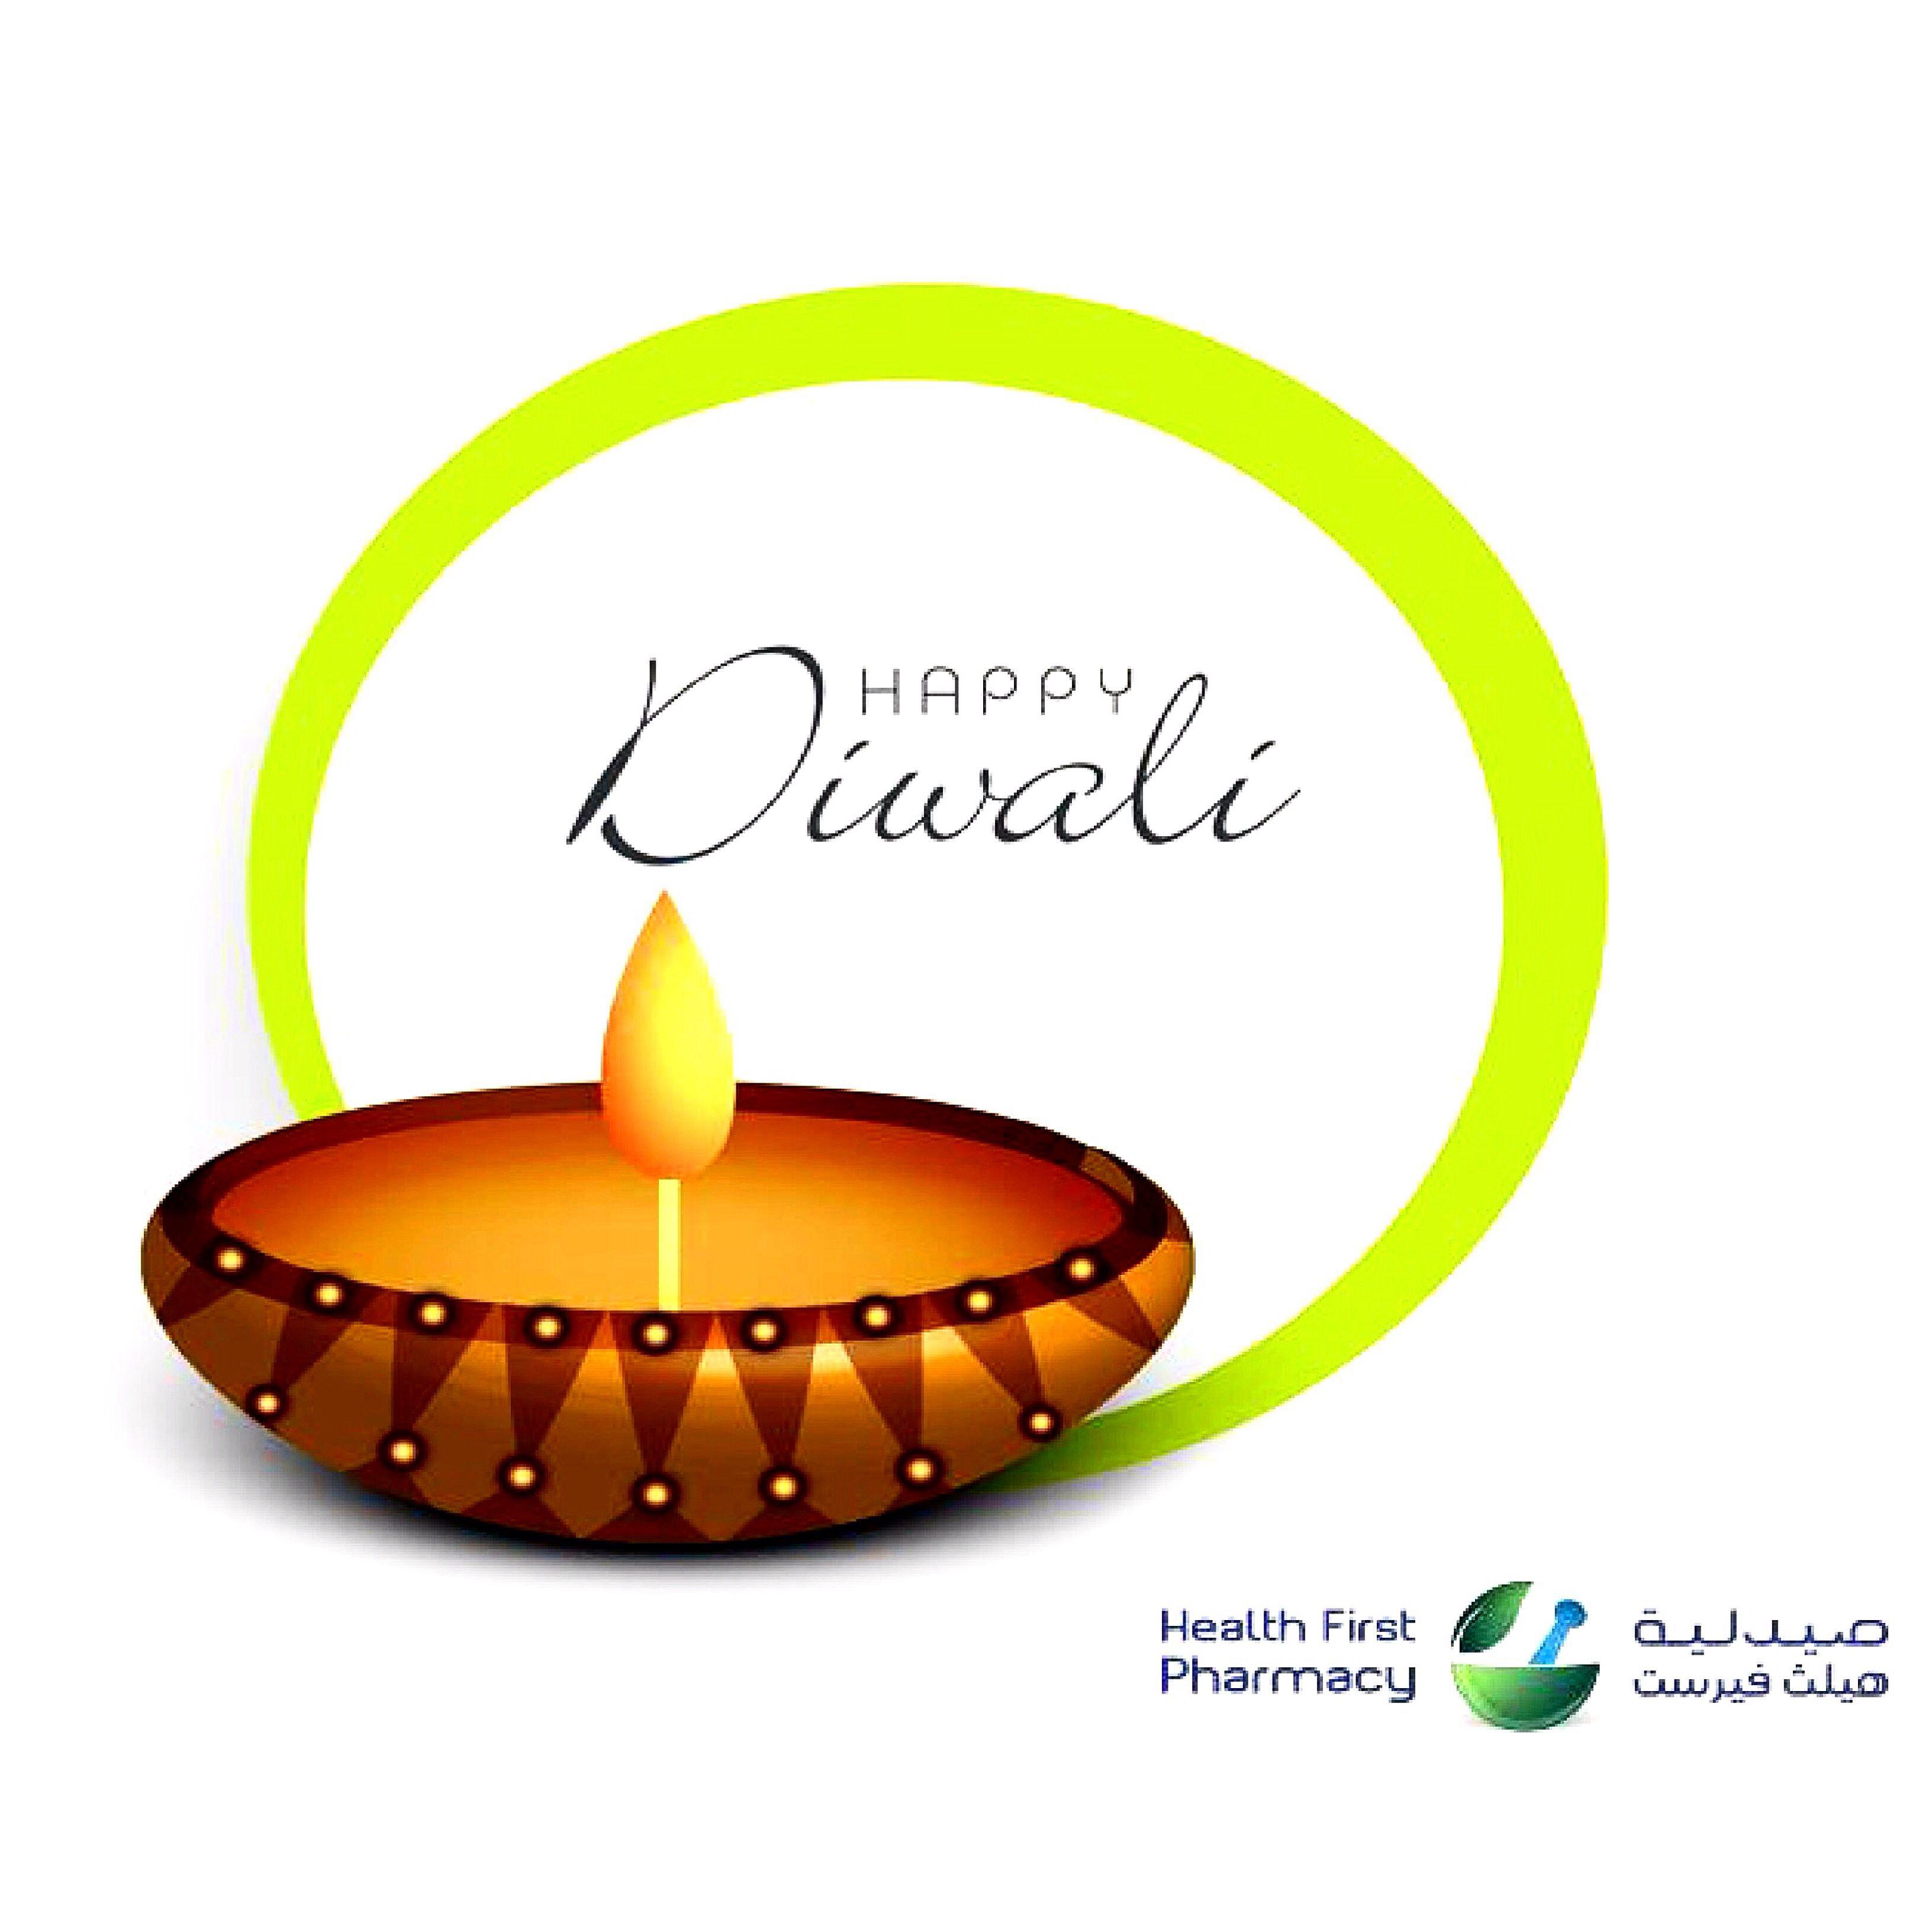 HappyDiwali from Health First Pharmacies! MyPharmacy